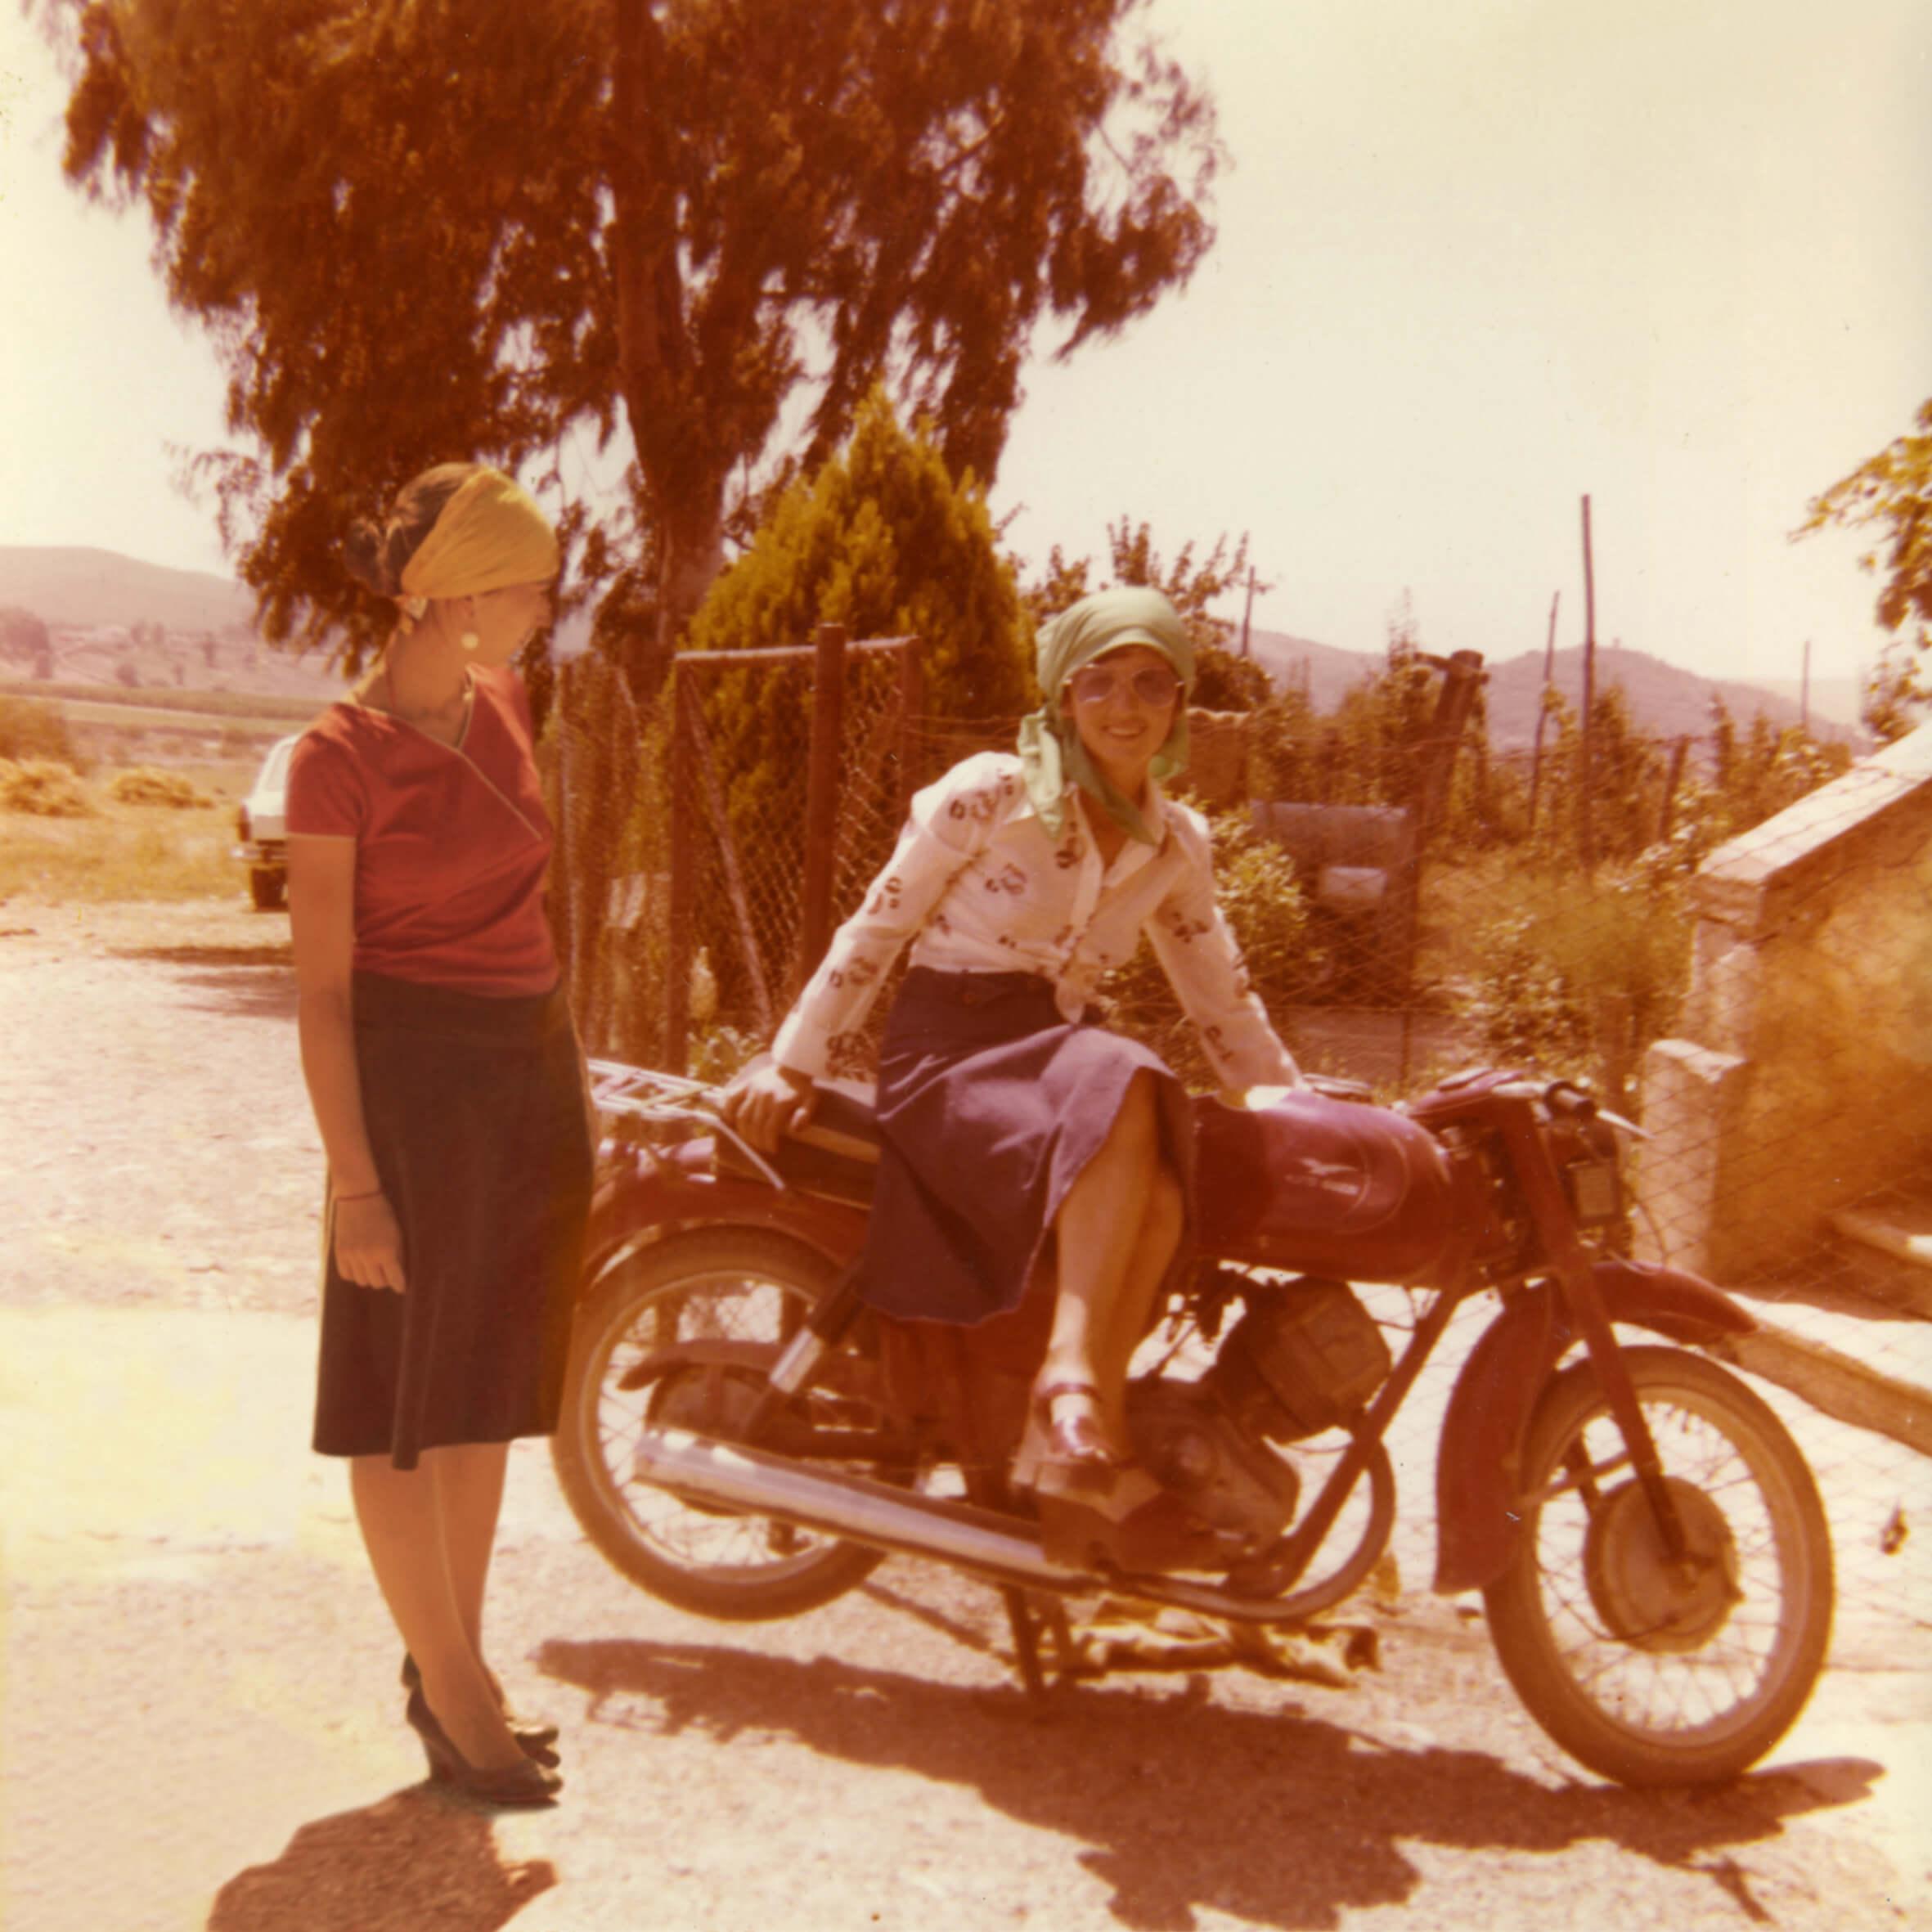 Moira Ricci, <em>20.12.53–10.08.04</em> (maman sur la moto de grand-mère), 2004-2014